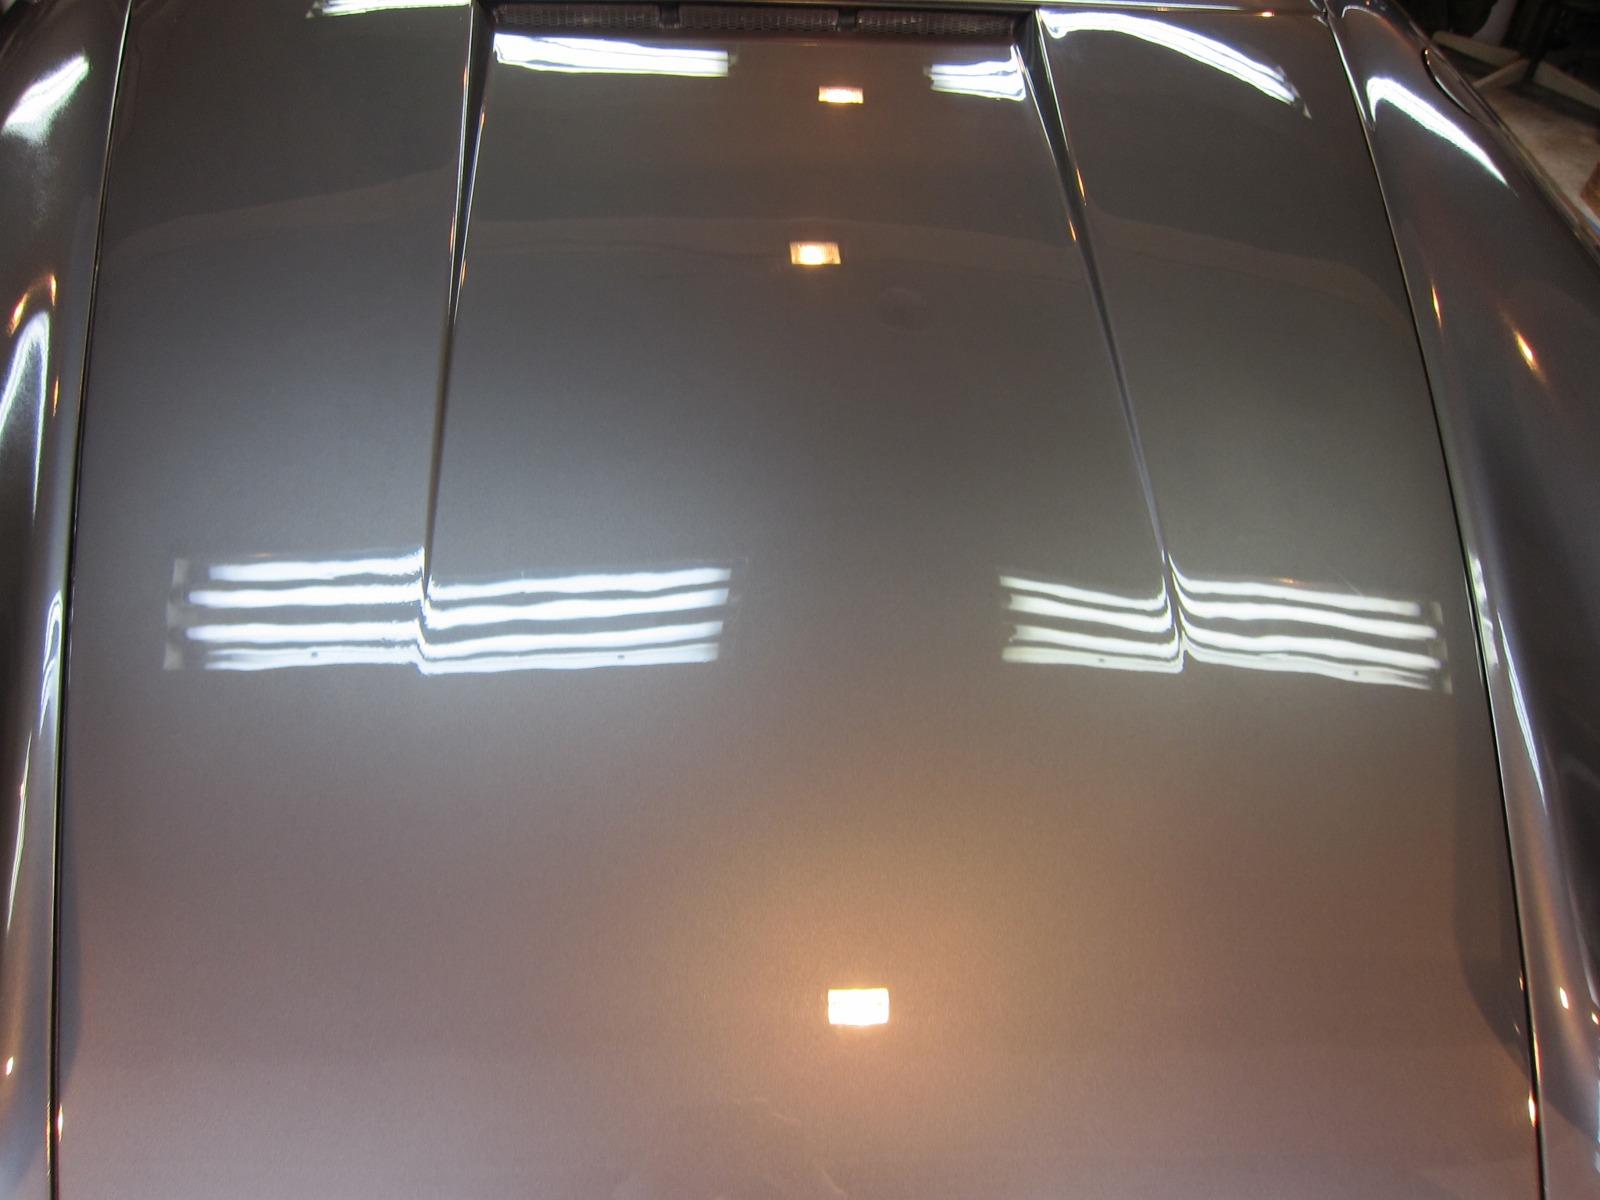 20140324-porshe-911-speedster-turbolook-11